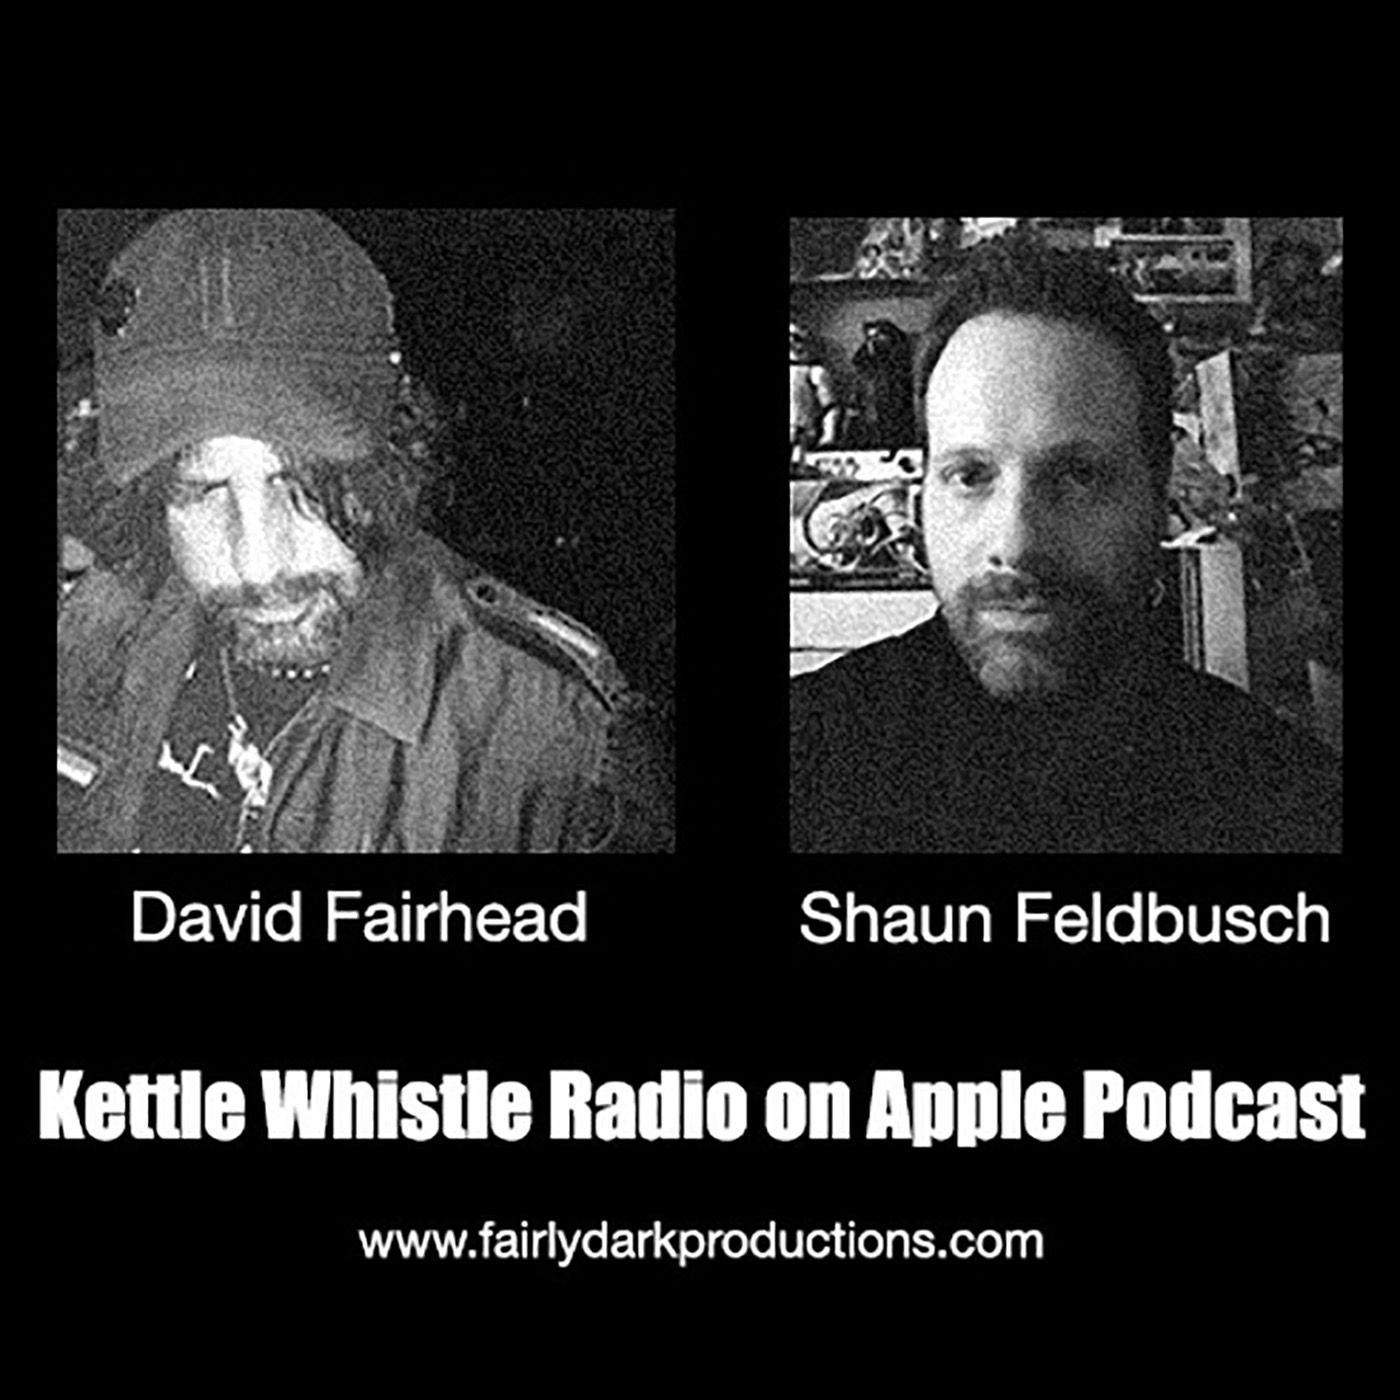 Kettle Whistle Radio